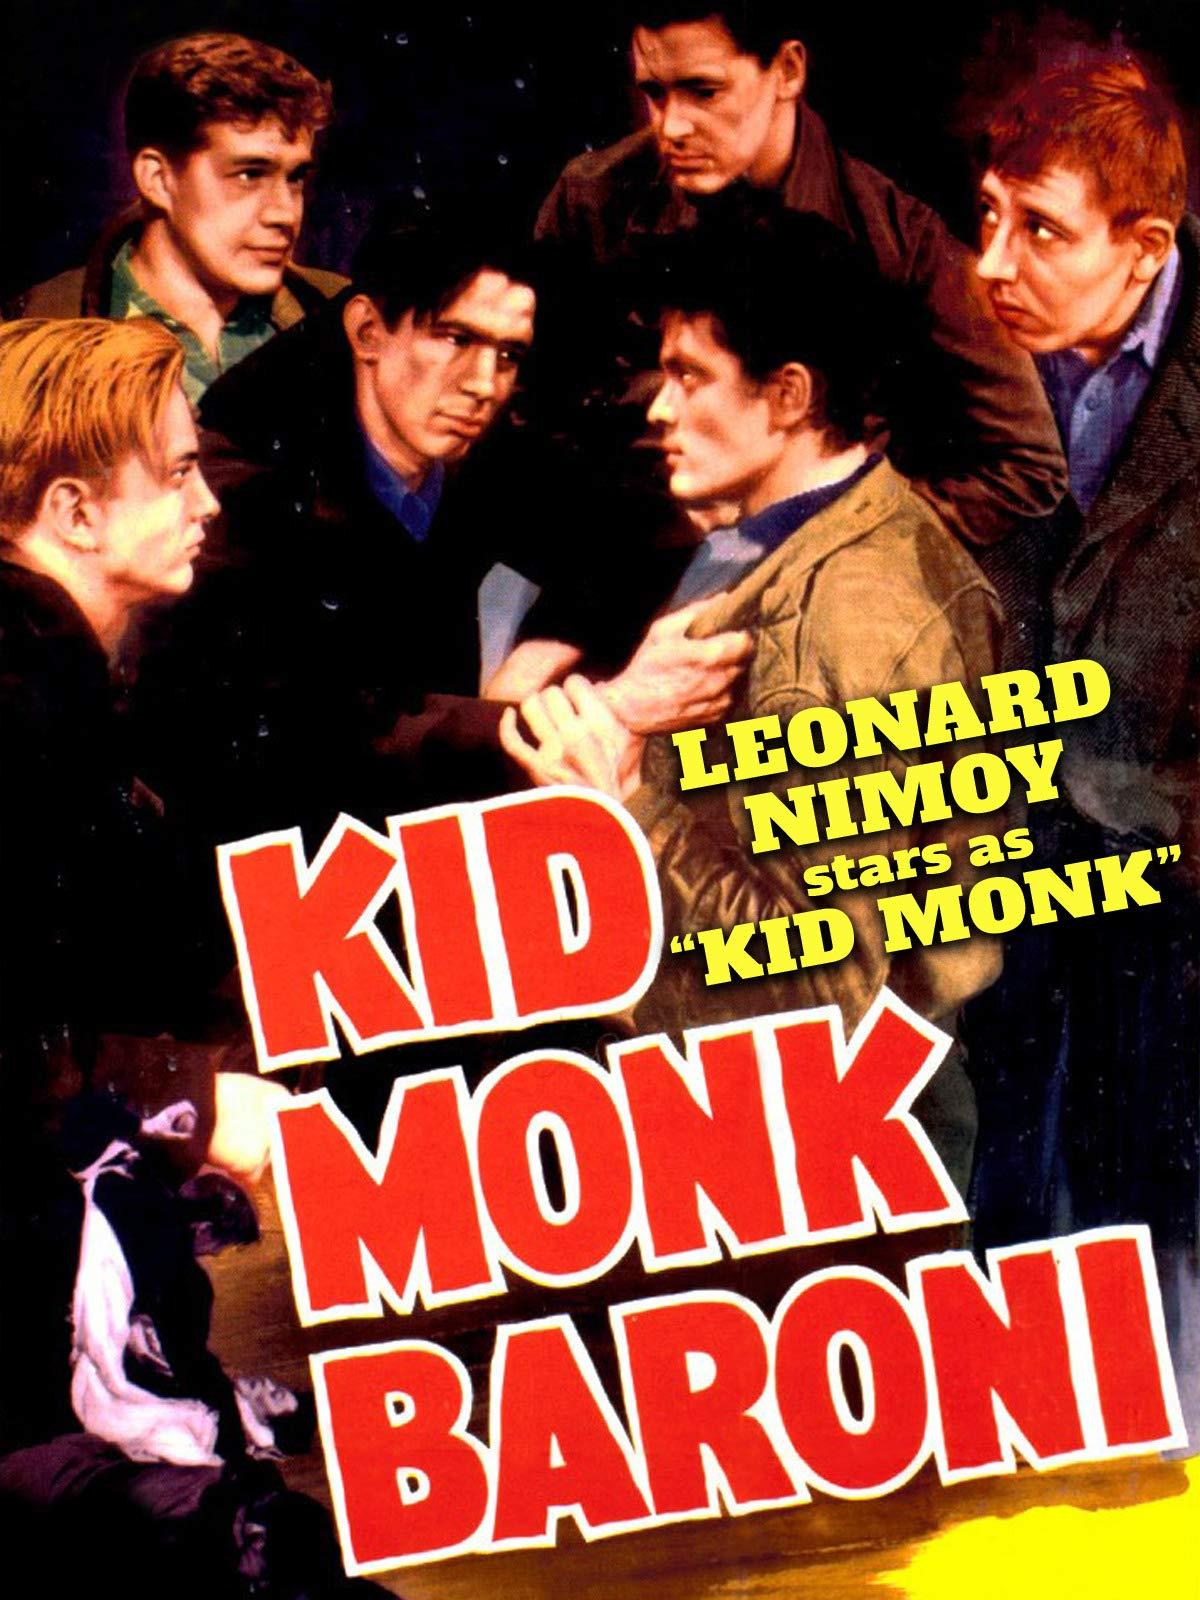 Kid Monk Baroni - Starring Leonard Nimoy as